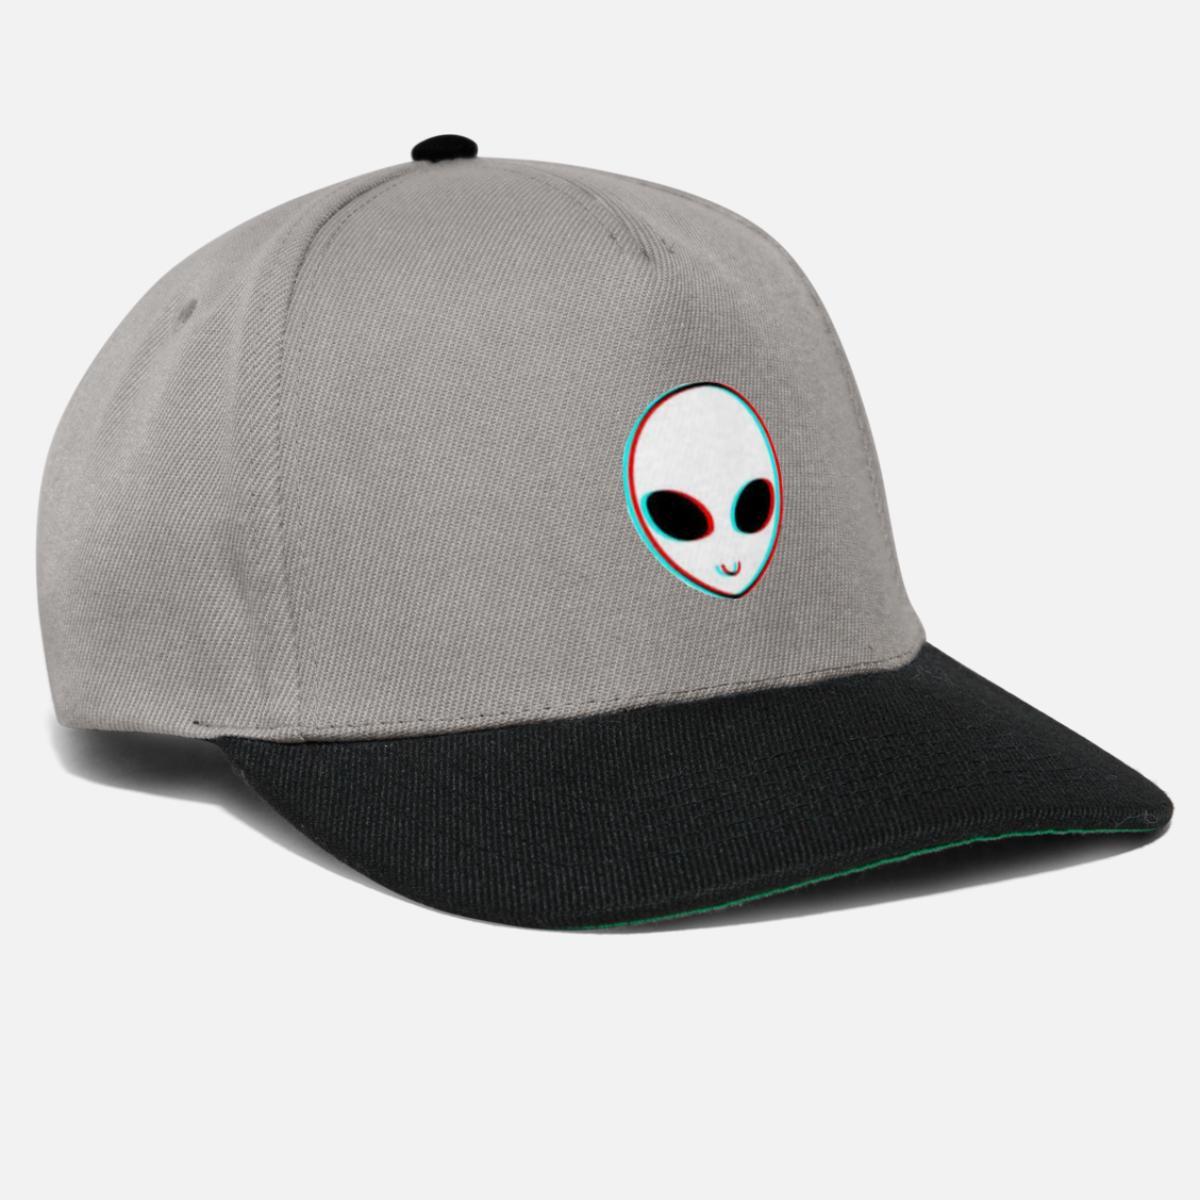 Alien gorra snapback spreadshirt jpg 1200x1200 Gorra fotos de ropa tumblr 4dee0450a61